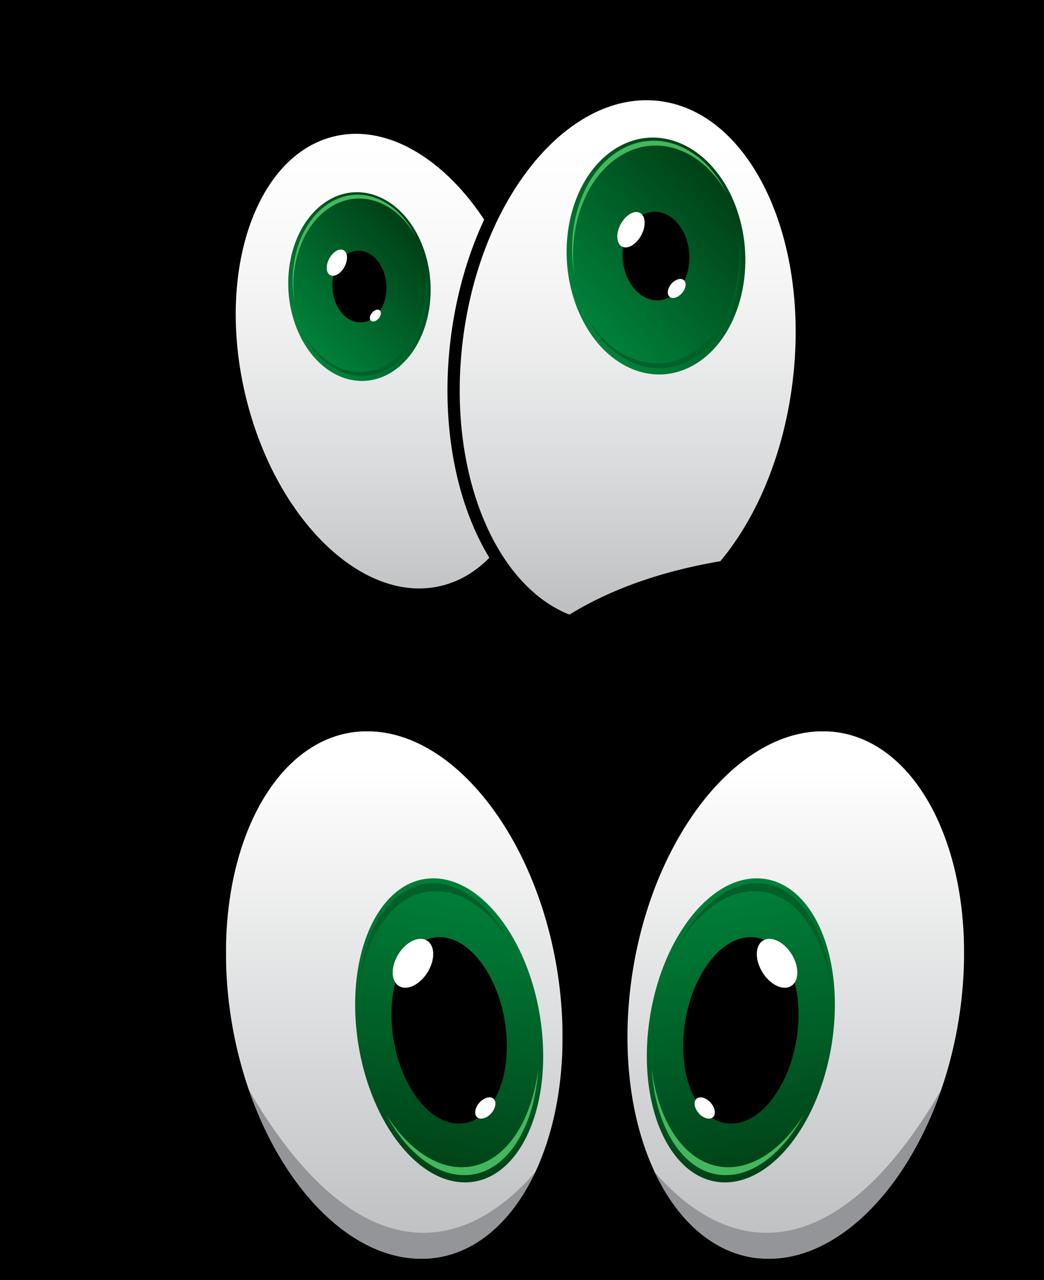 clip art library download eyeball clipart proper care eye #78649285